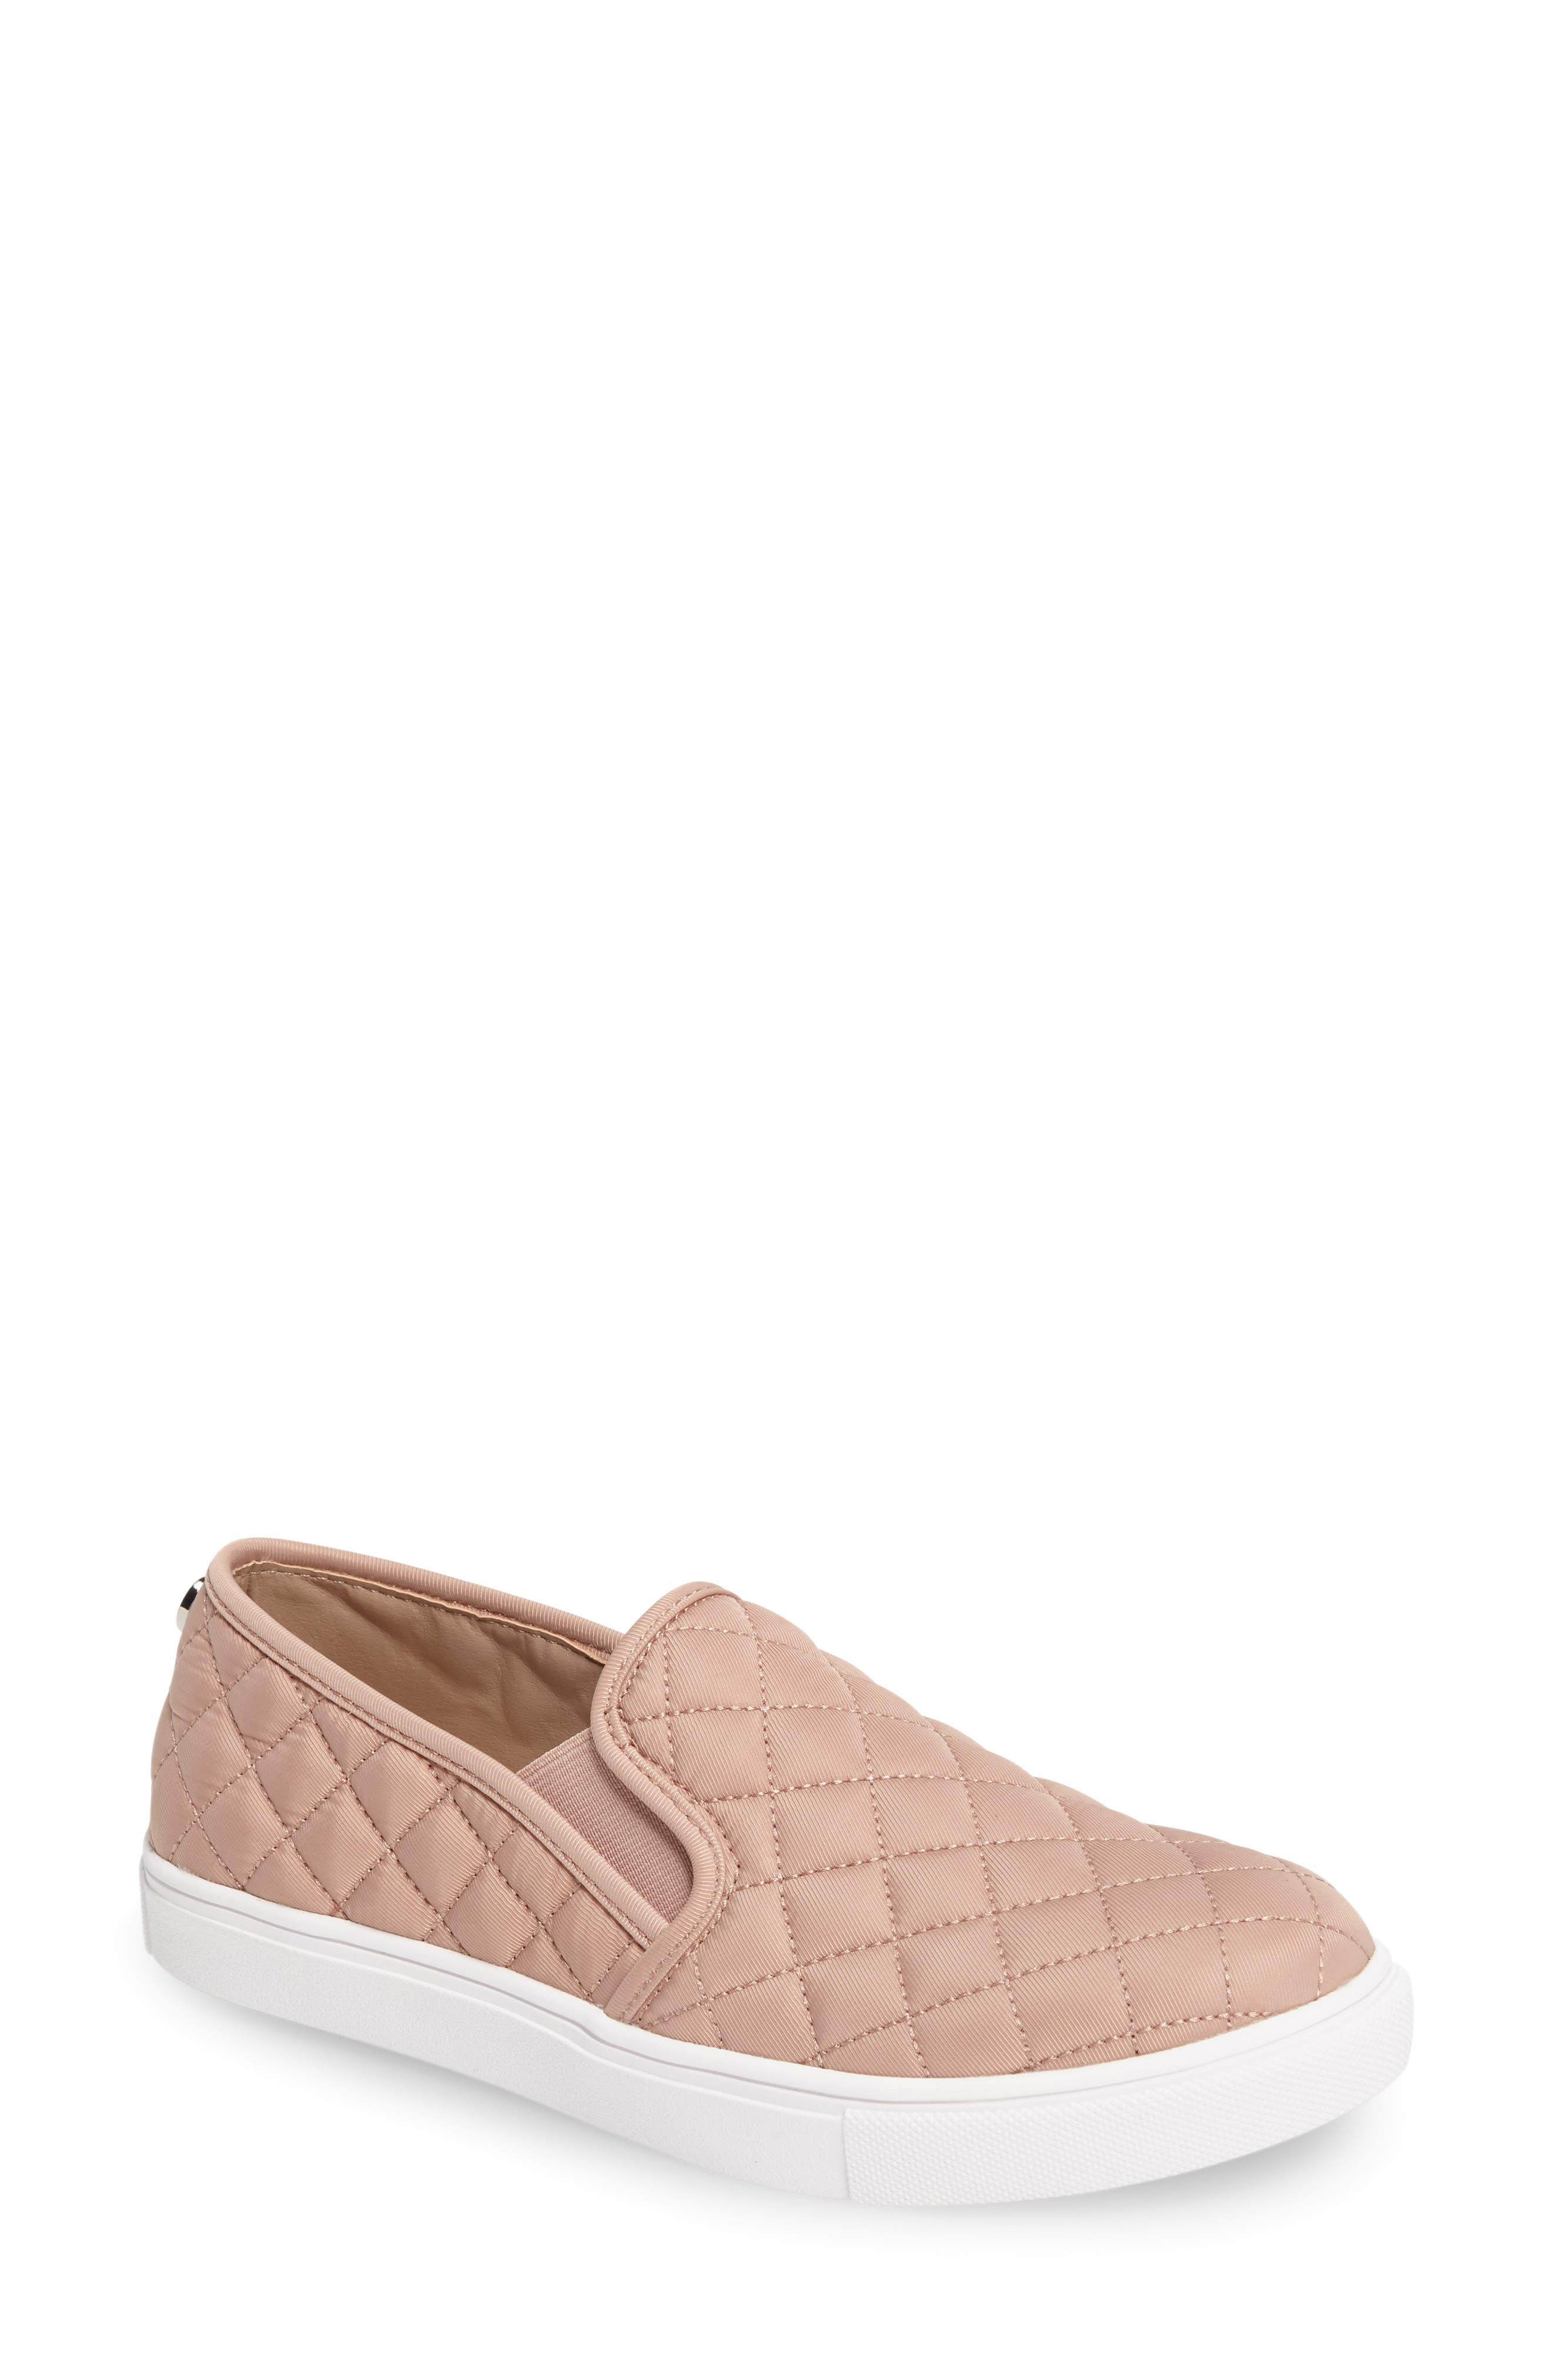 STEVE MADDEN 'Ecntrcqt' Sneaker, Main, color, BLUSH FABRIC